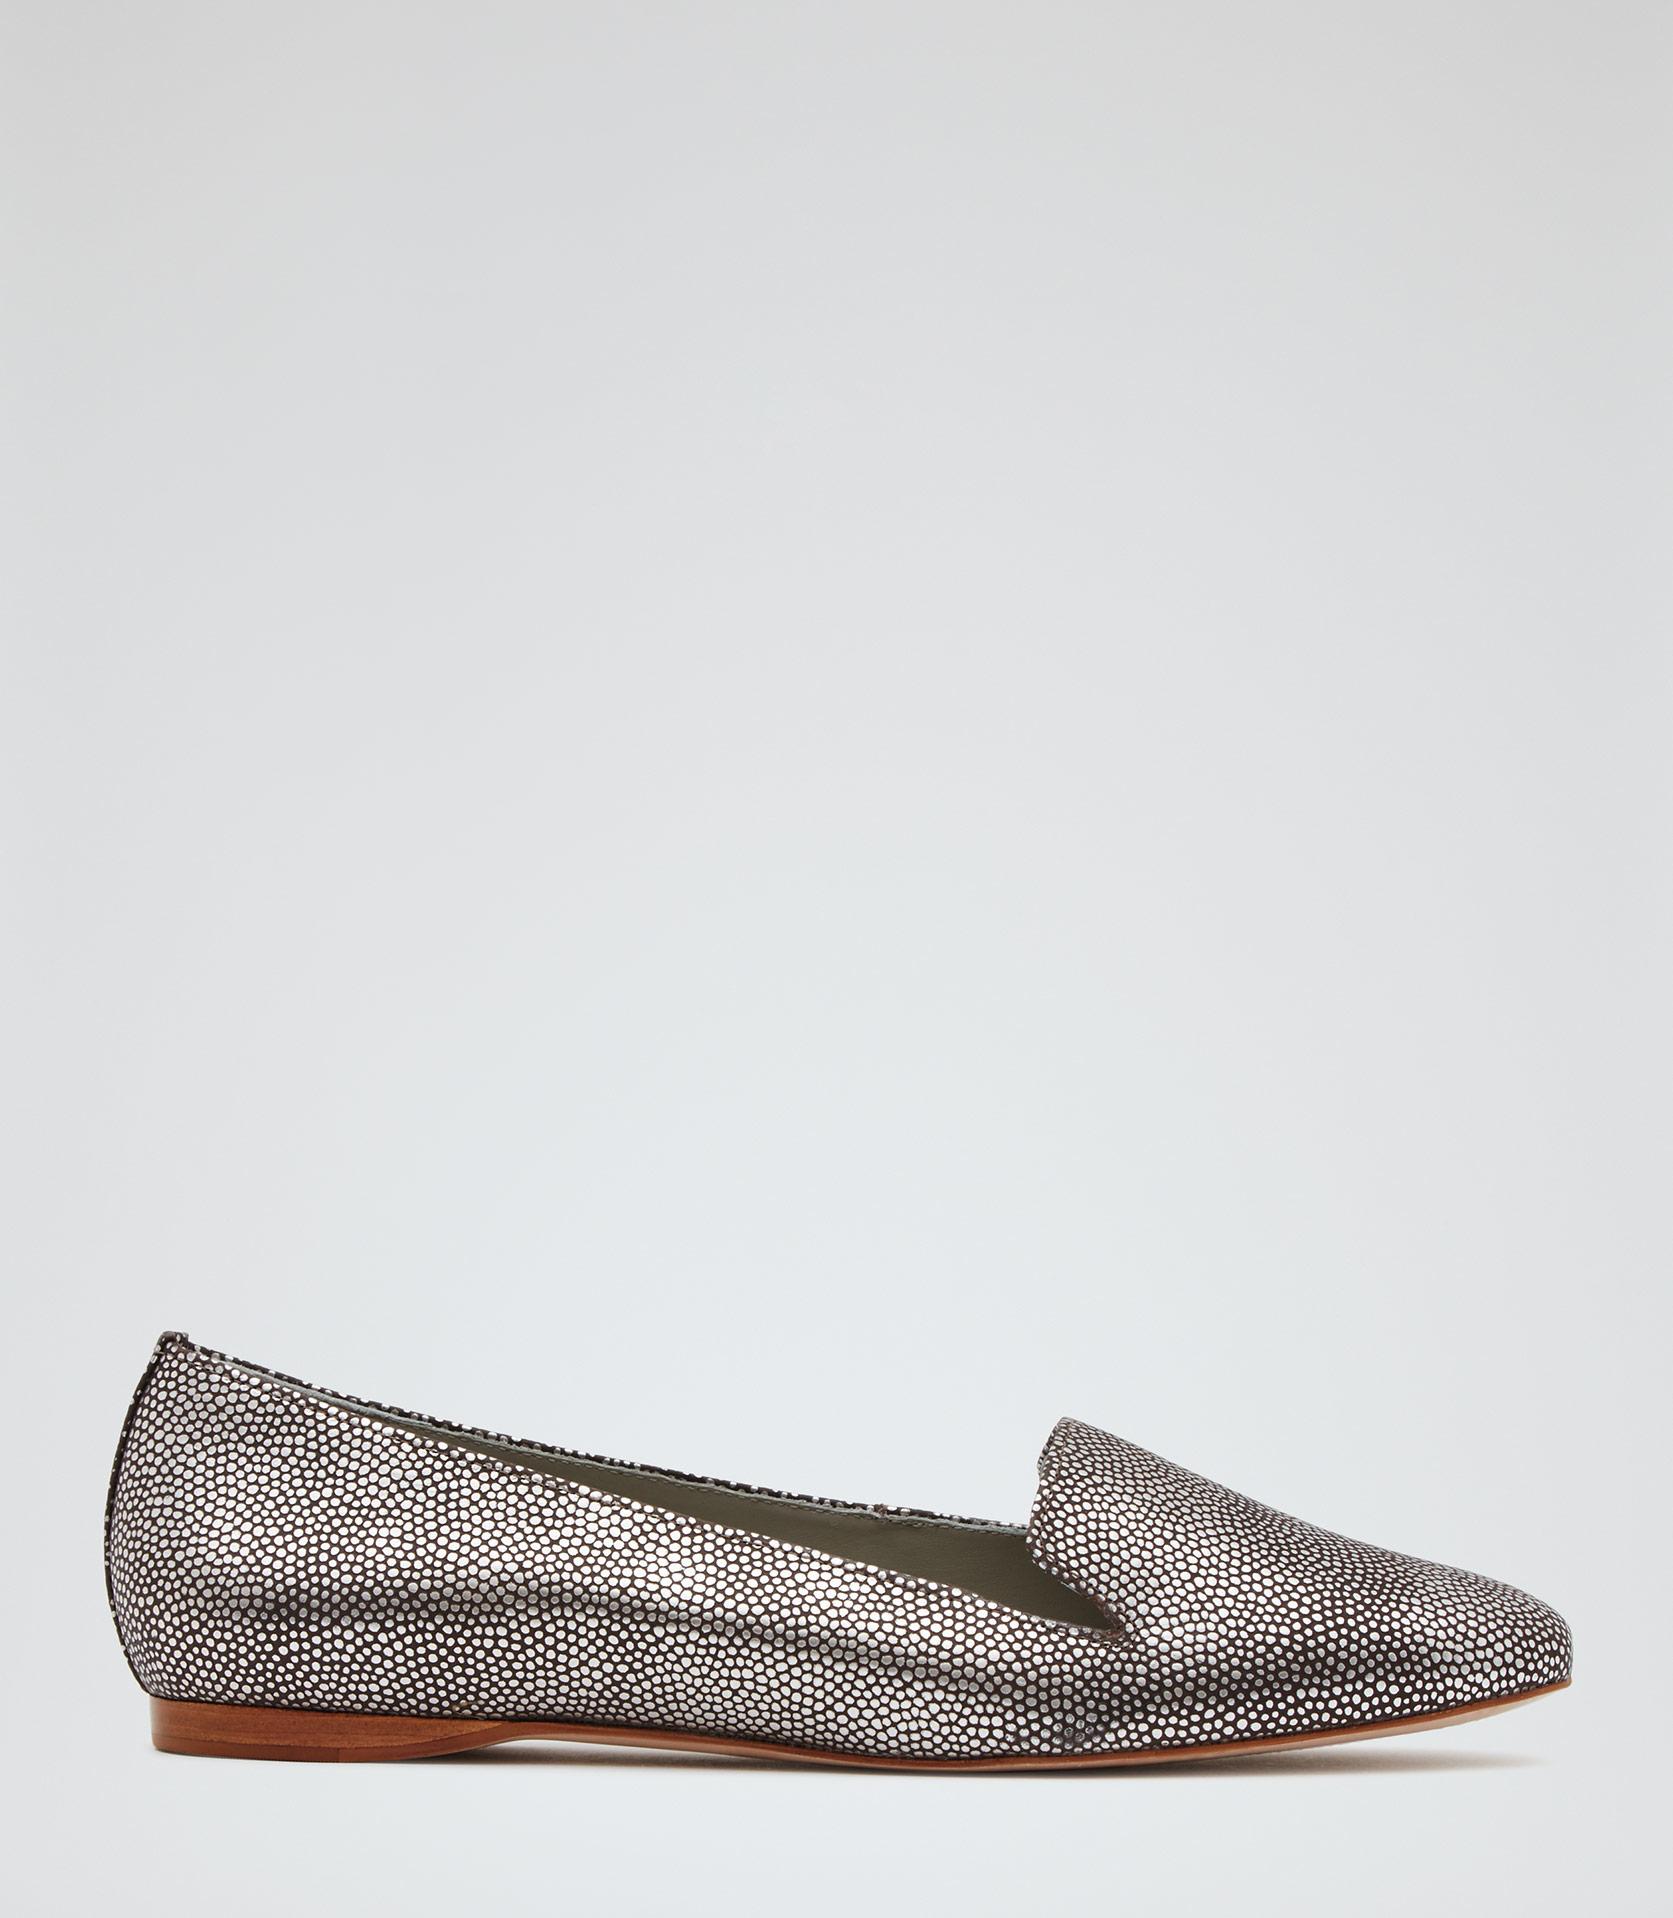 3a4700c8a9e Lyst - Reiss Lillie Metallic Flat Shoes in Metallic